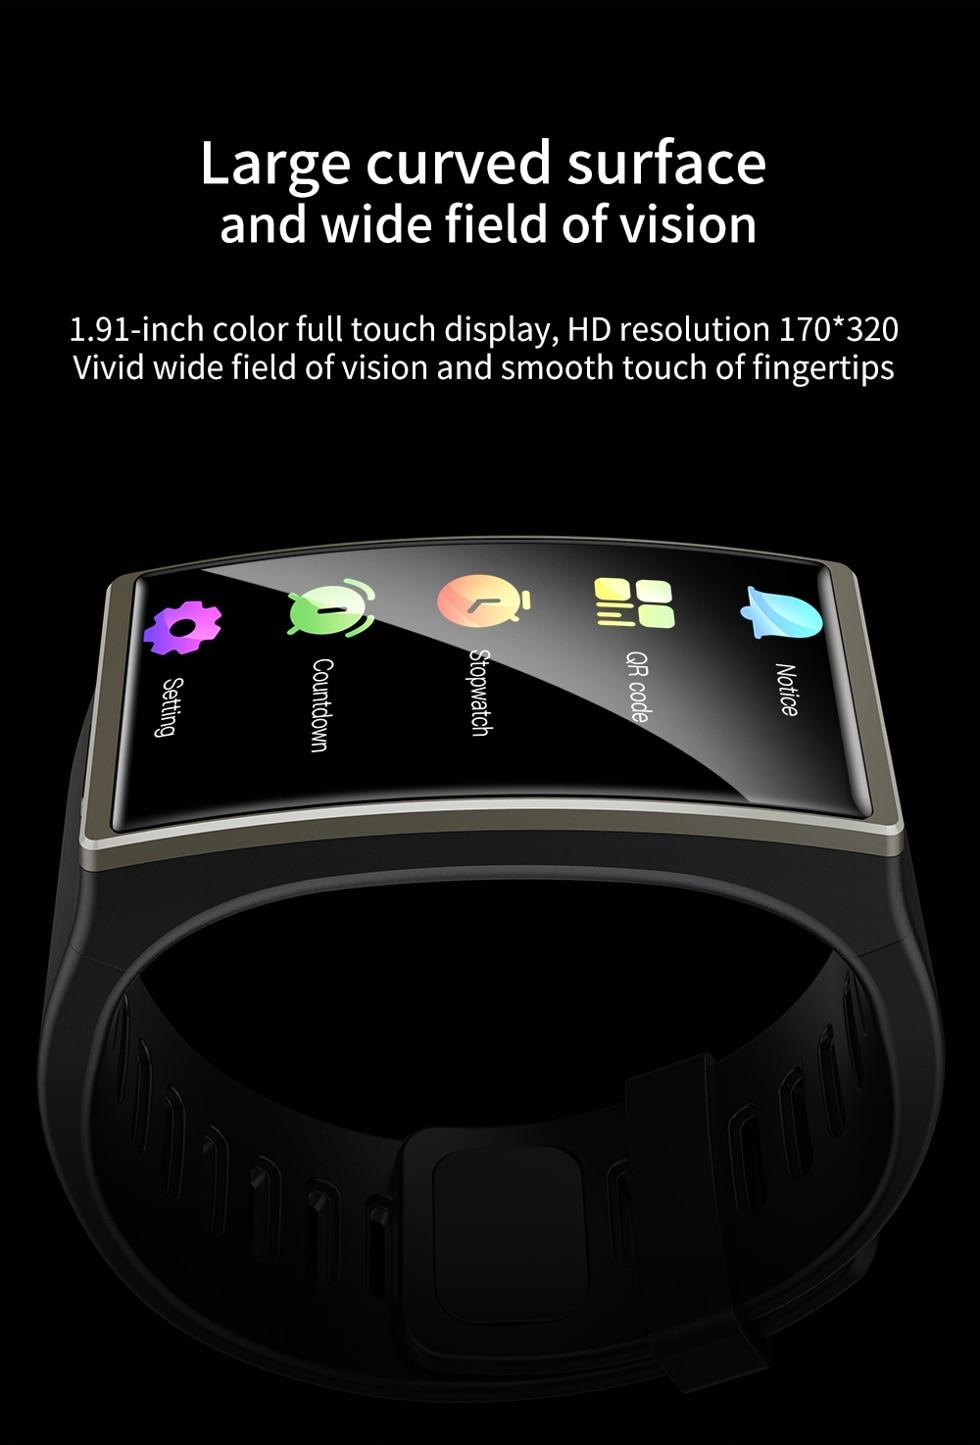 Haa86d08a6fc0479c94a7710263a5204em Smartwatch 2020 1.9 Inch 170*320 Screen LEMFO DM12 Smart Watch Men IP68 Waterproof Sport Heart Rate Blood Pressure Android IOS